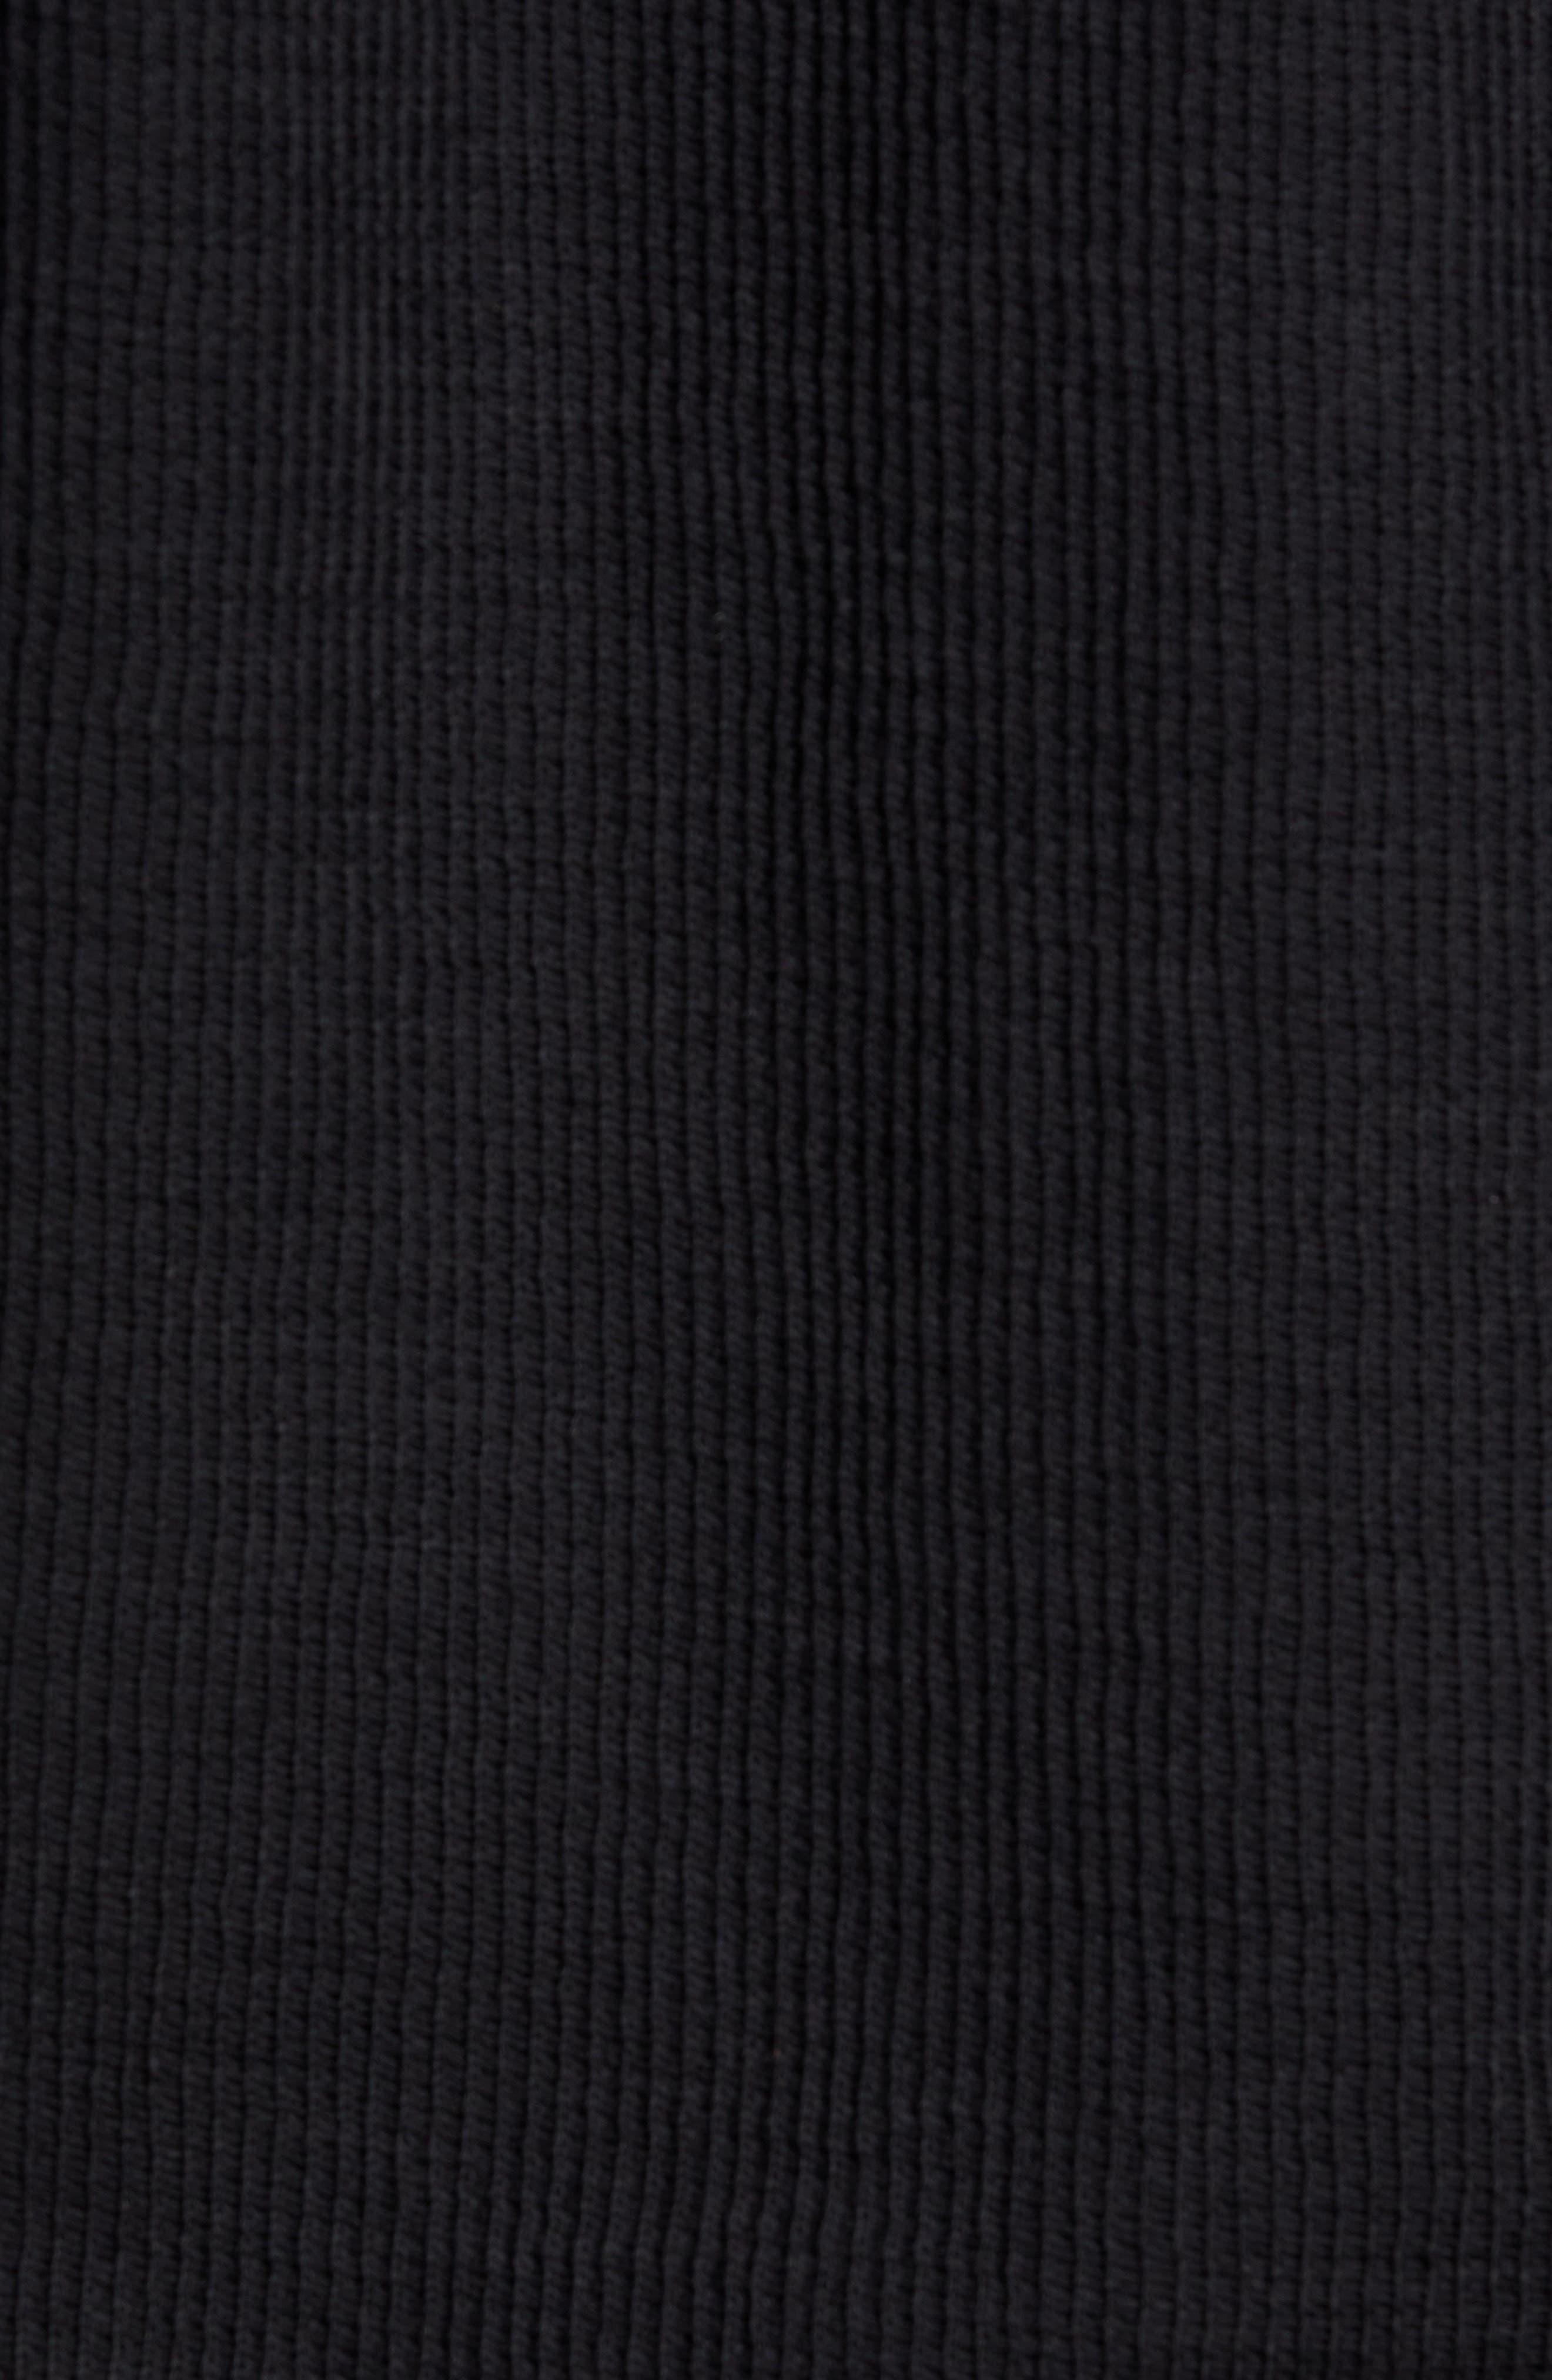 Sportswear Air Force 1 Long Sleeve Top,                             Alternate thumbnail 5, color,                             BLACK